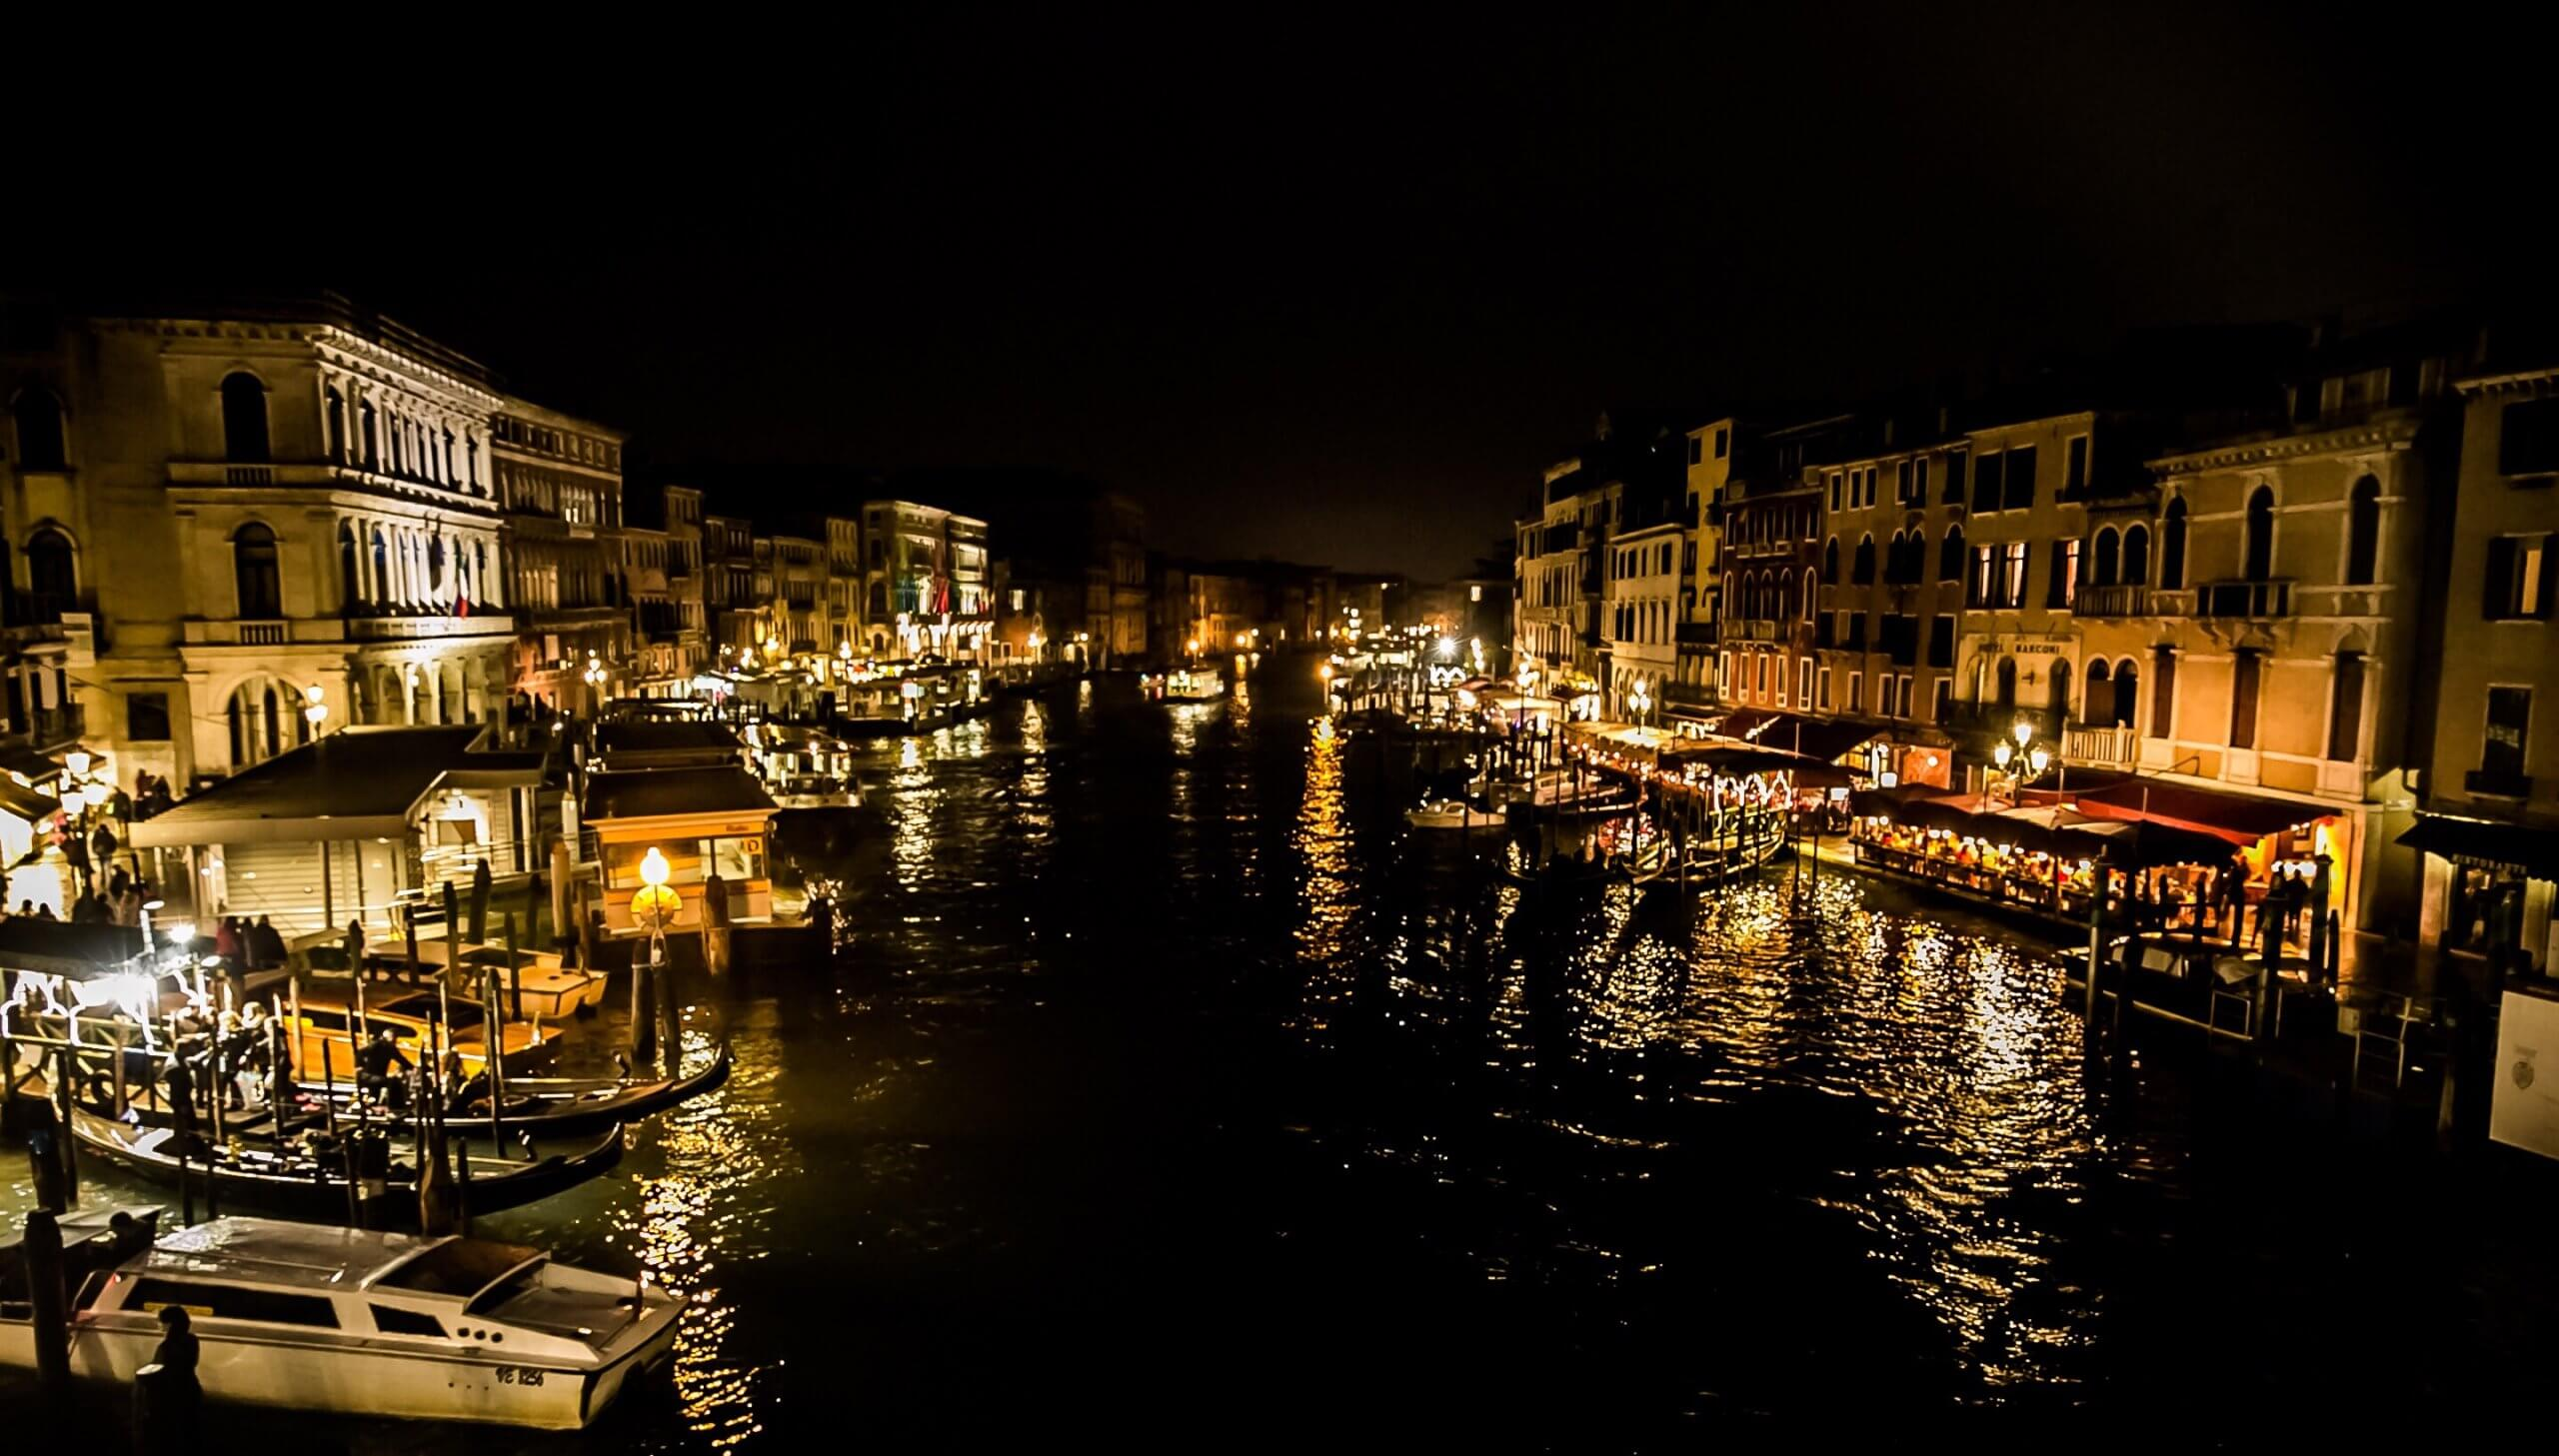 noite em veneza t20 e8bEno scaled